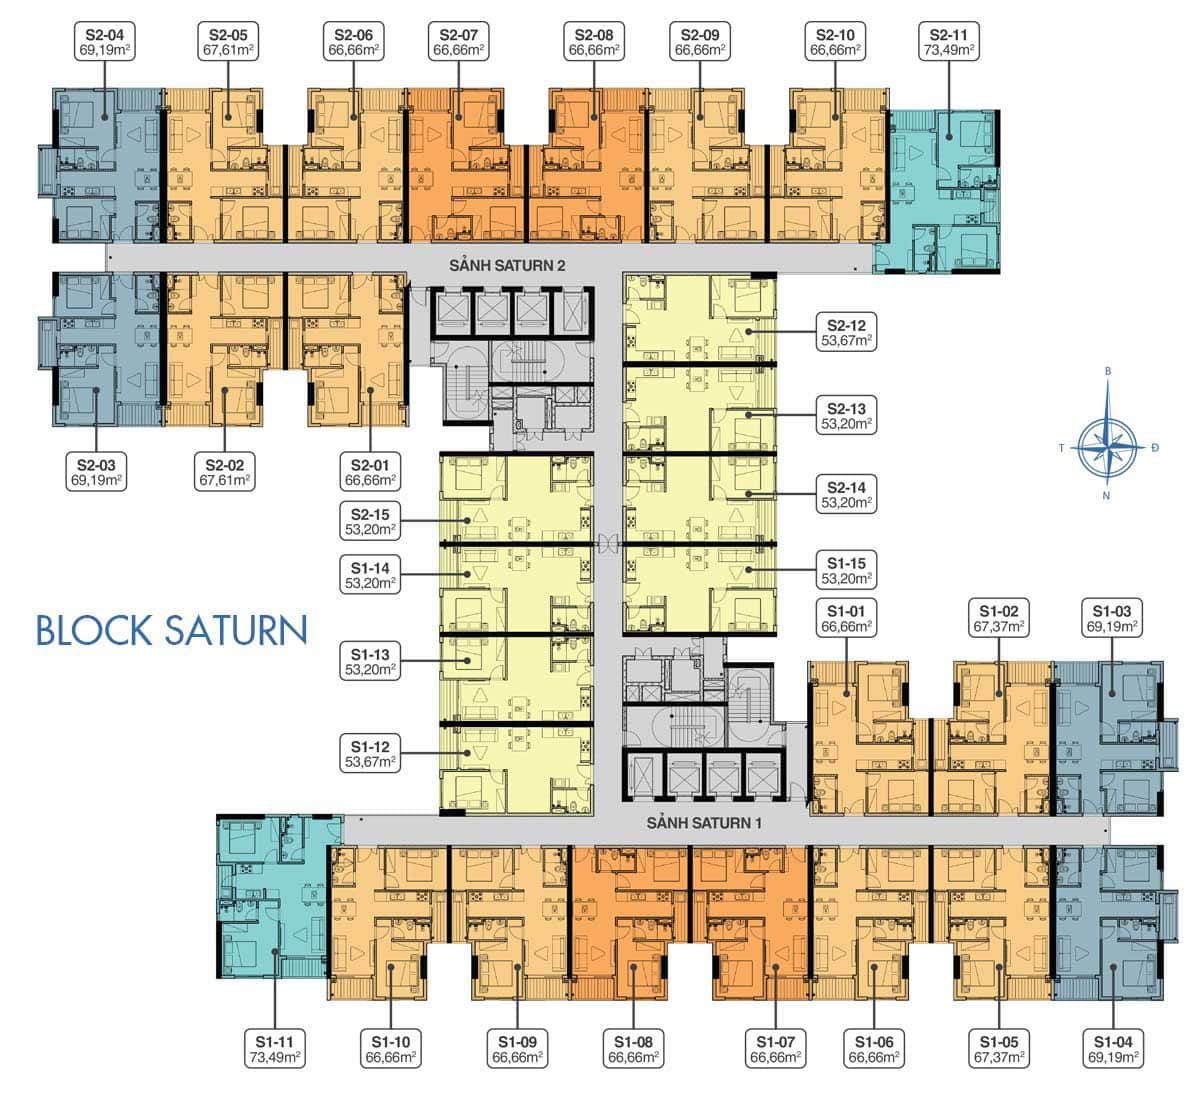 Mặt bằng Block Saturn dự án Q7 Saigon Riverside Complex